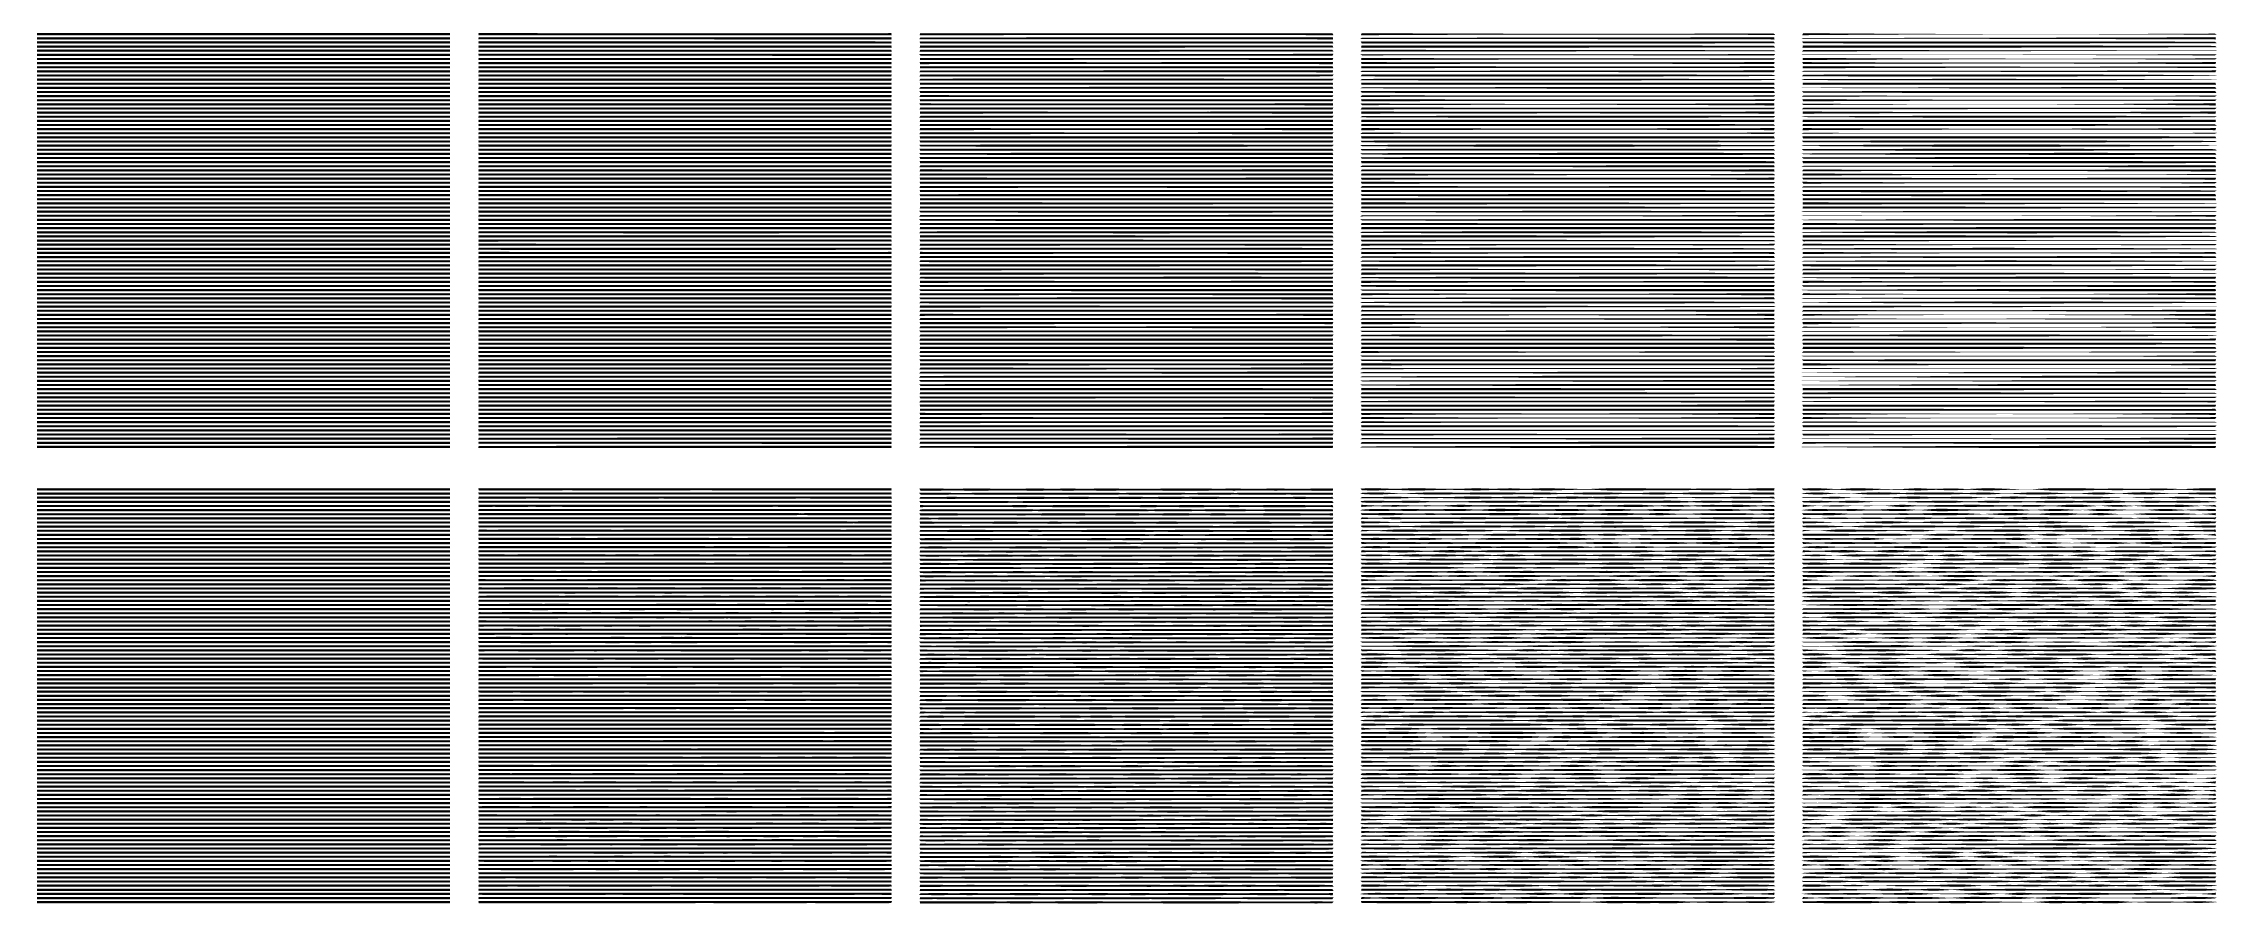 wlines-11.jpg